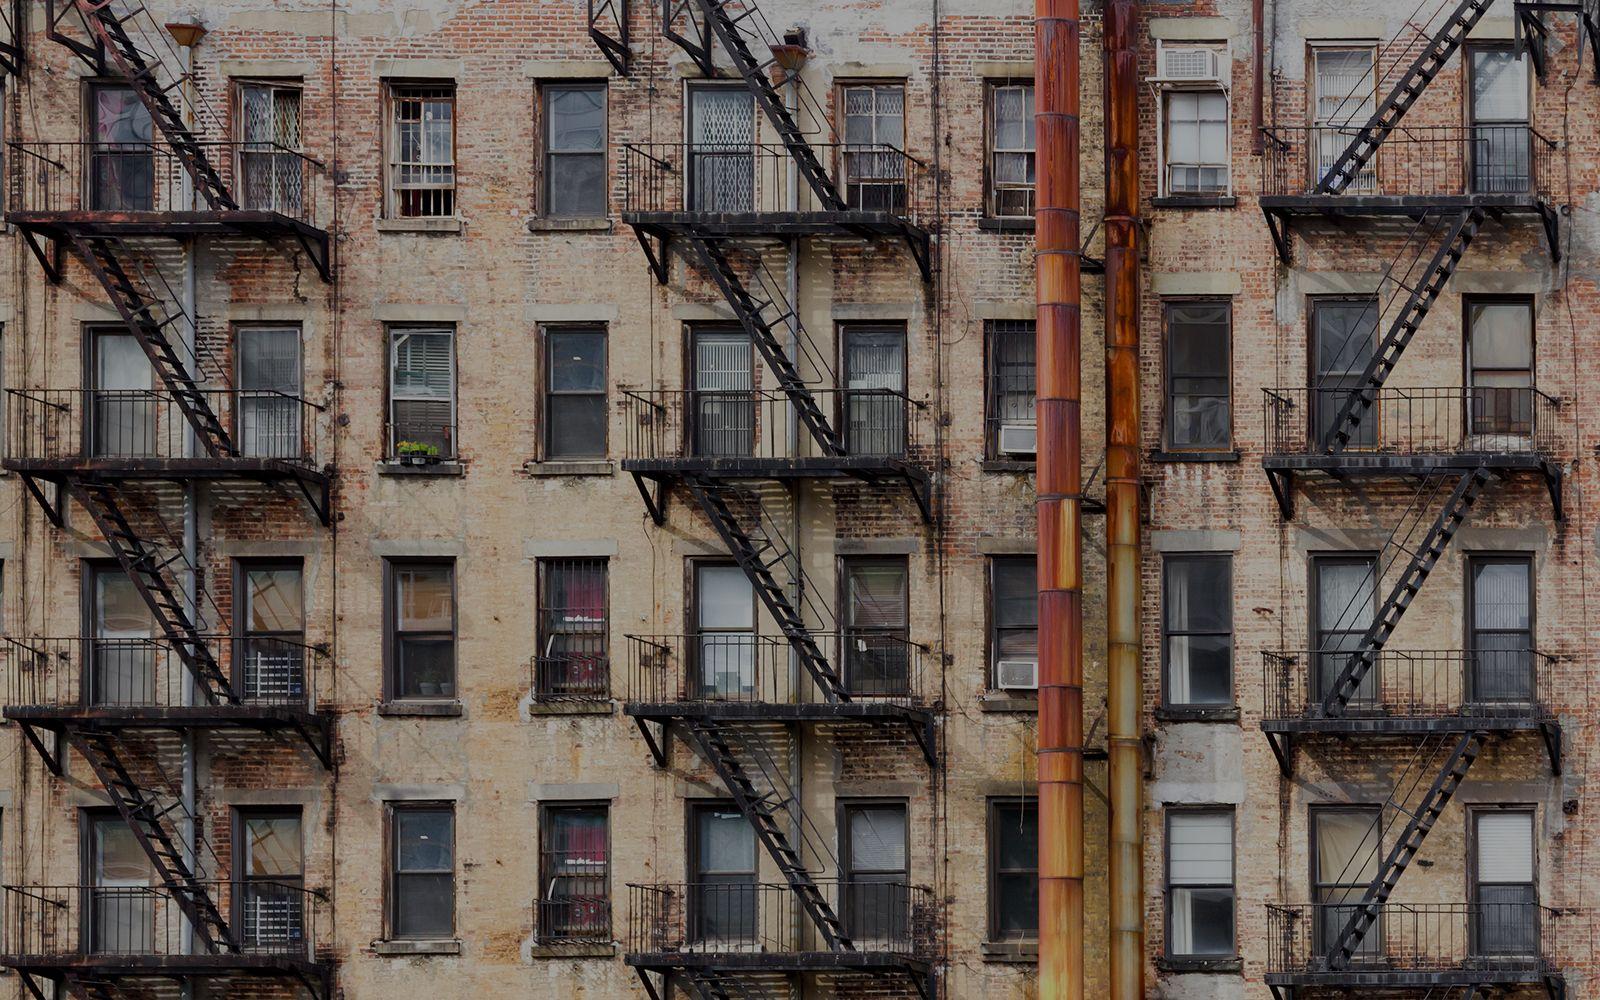 Eviction Data: Biggest Toll On Blacks, Women, Vulnerable